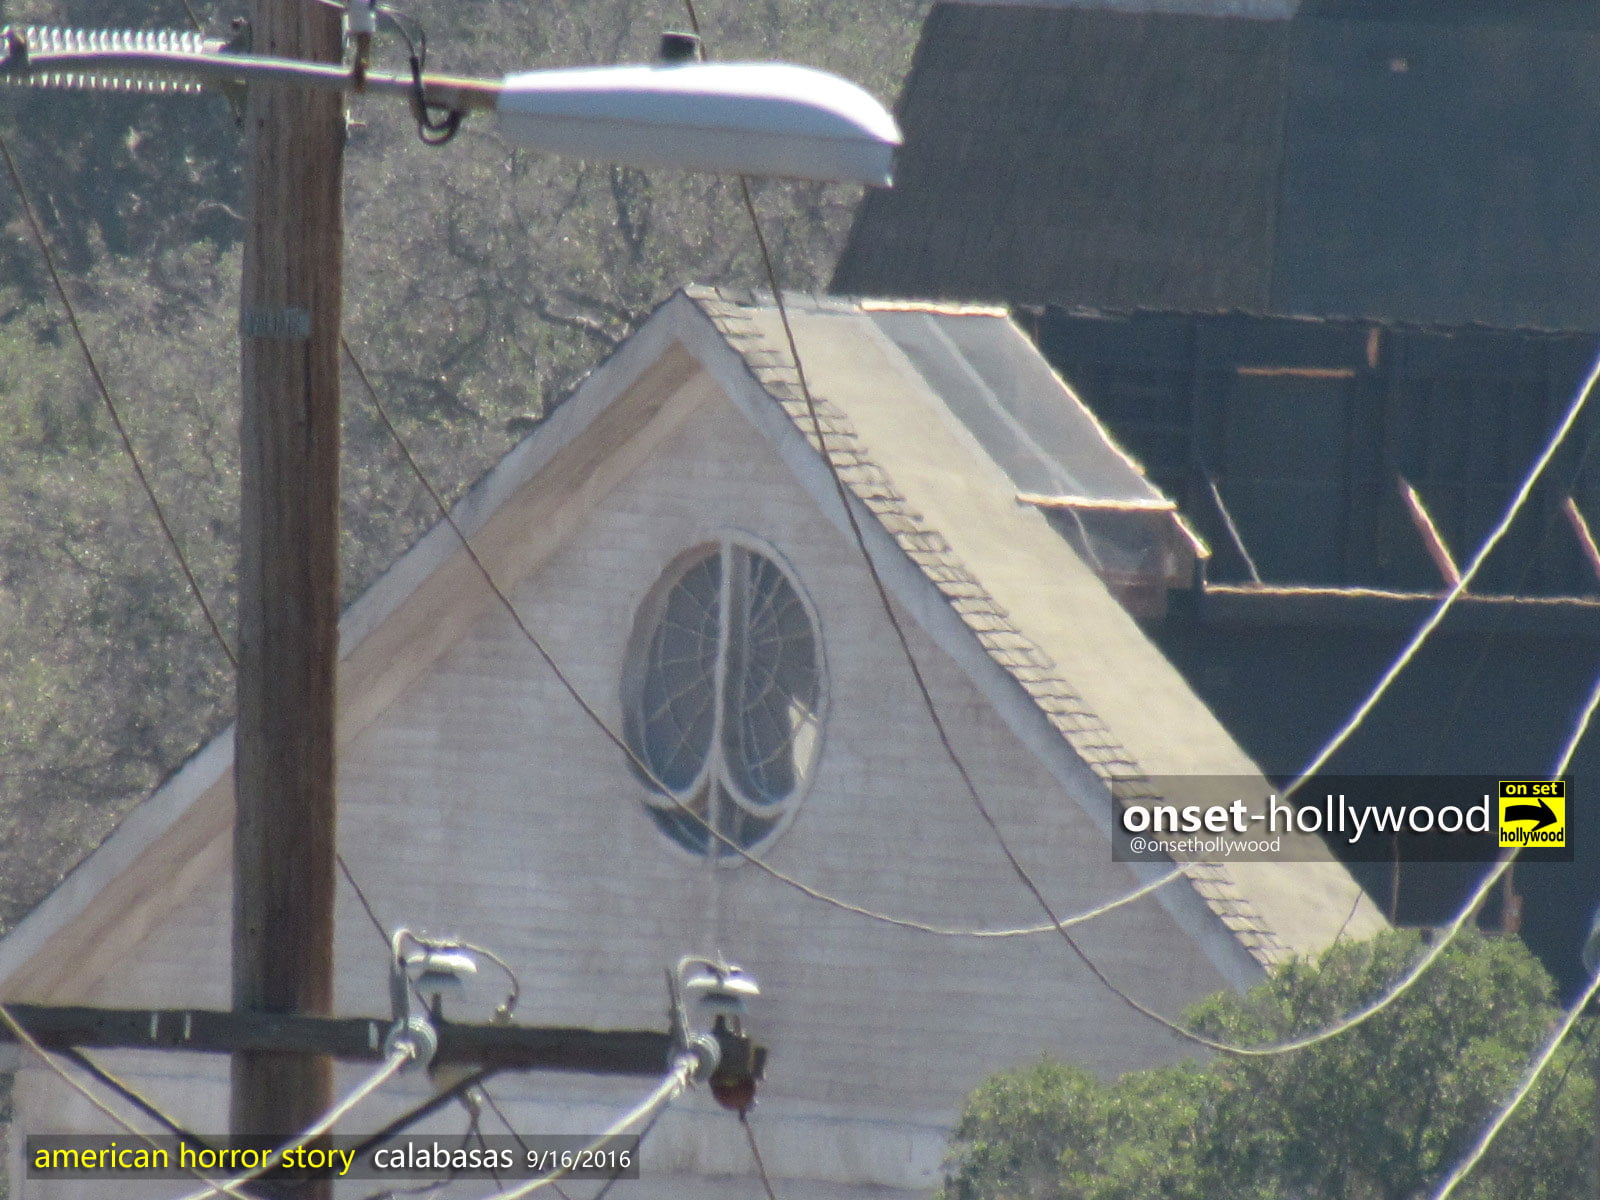 american-horror-story-season-6-my-roanoke-nightmare-filming-locations-calabasas-secret-location-pic6